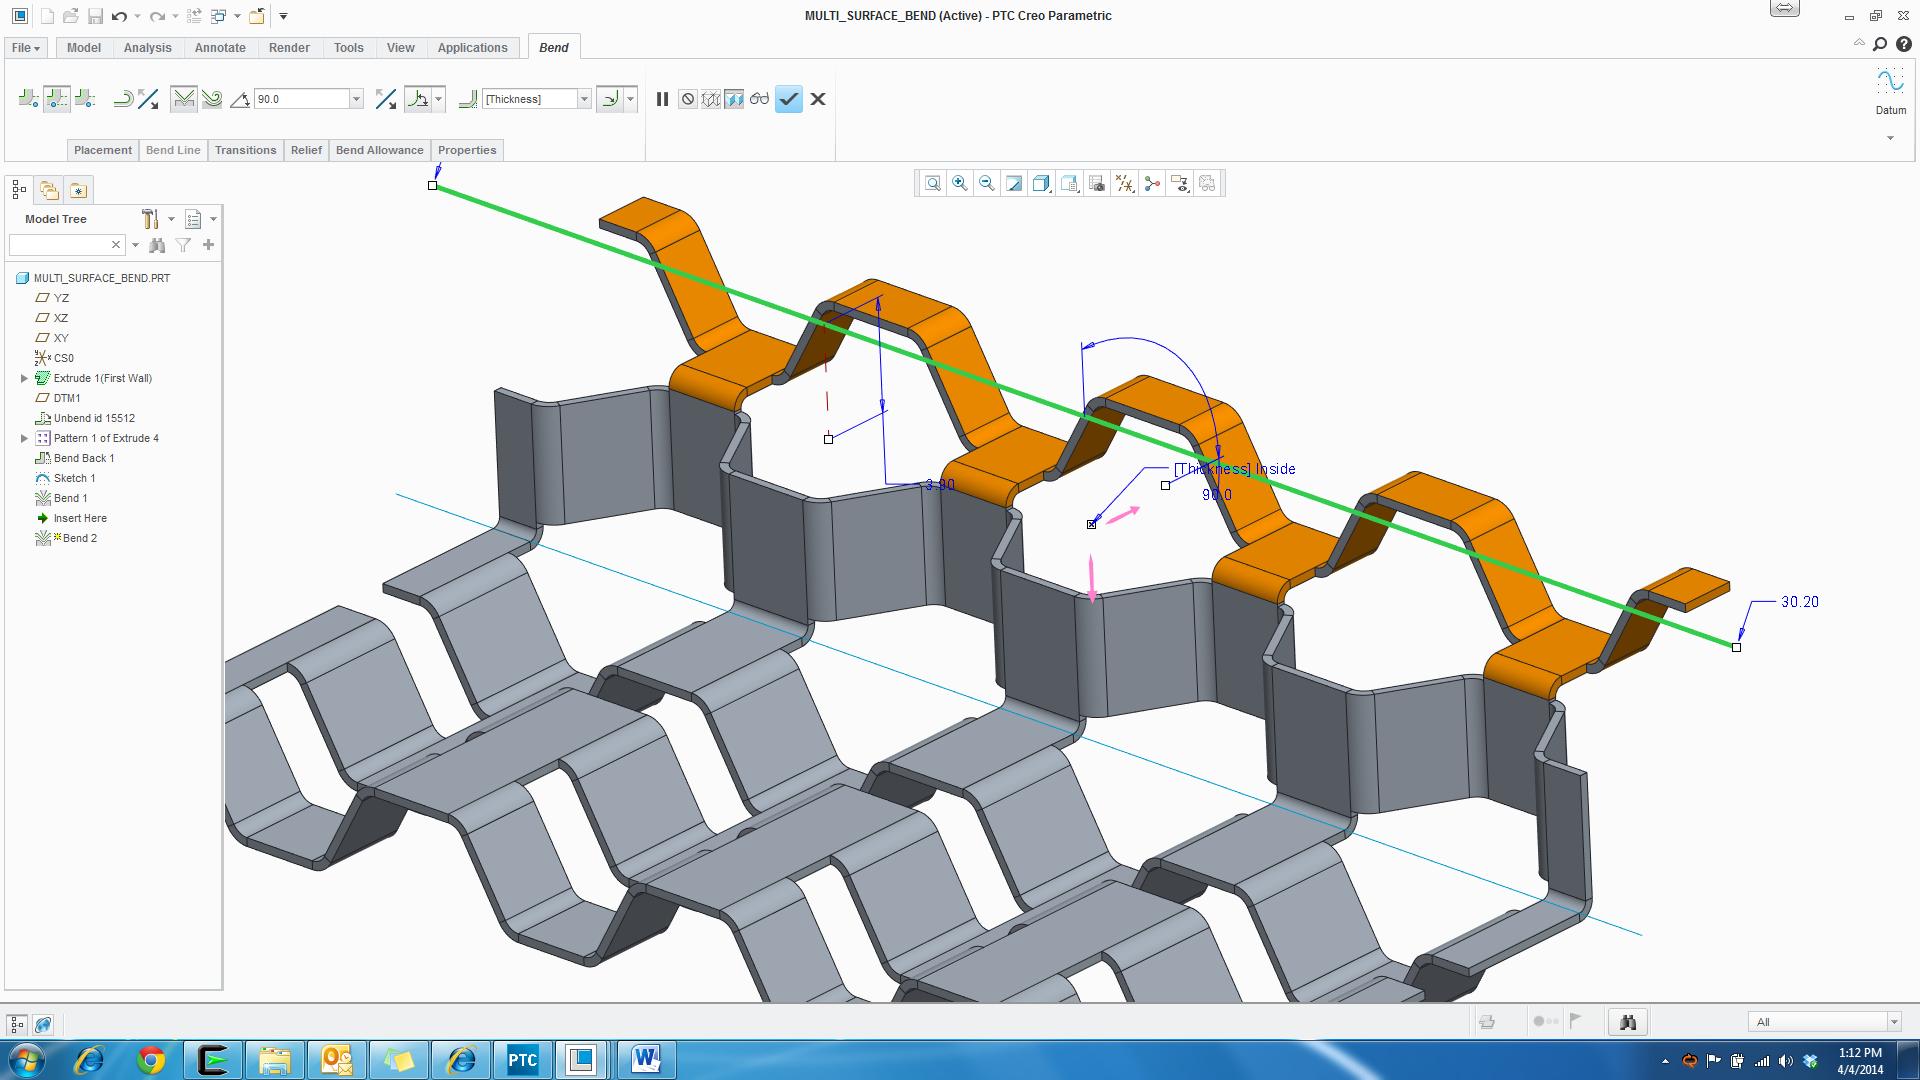 PTC Creo Parametric - Sheetmetal.png